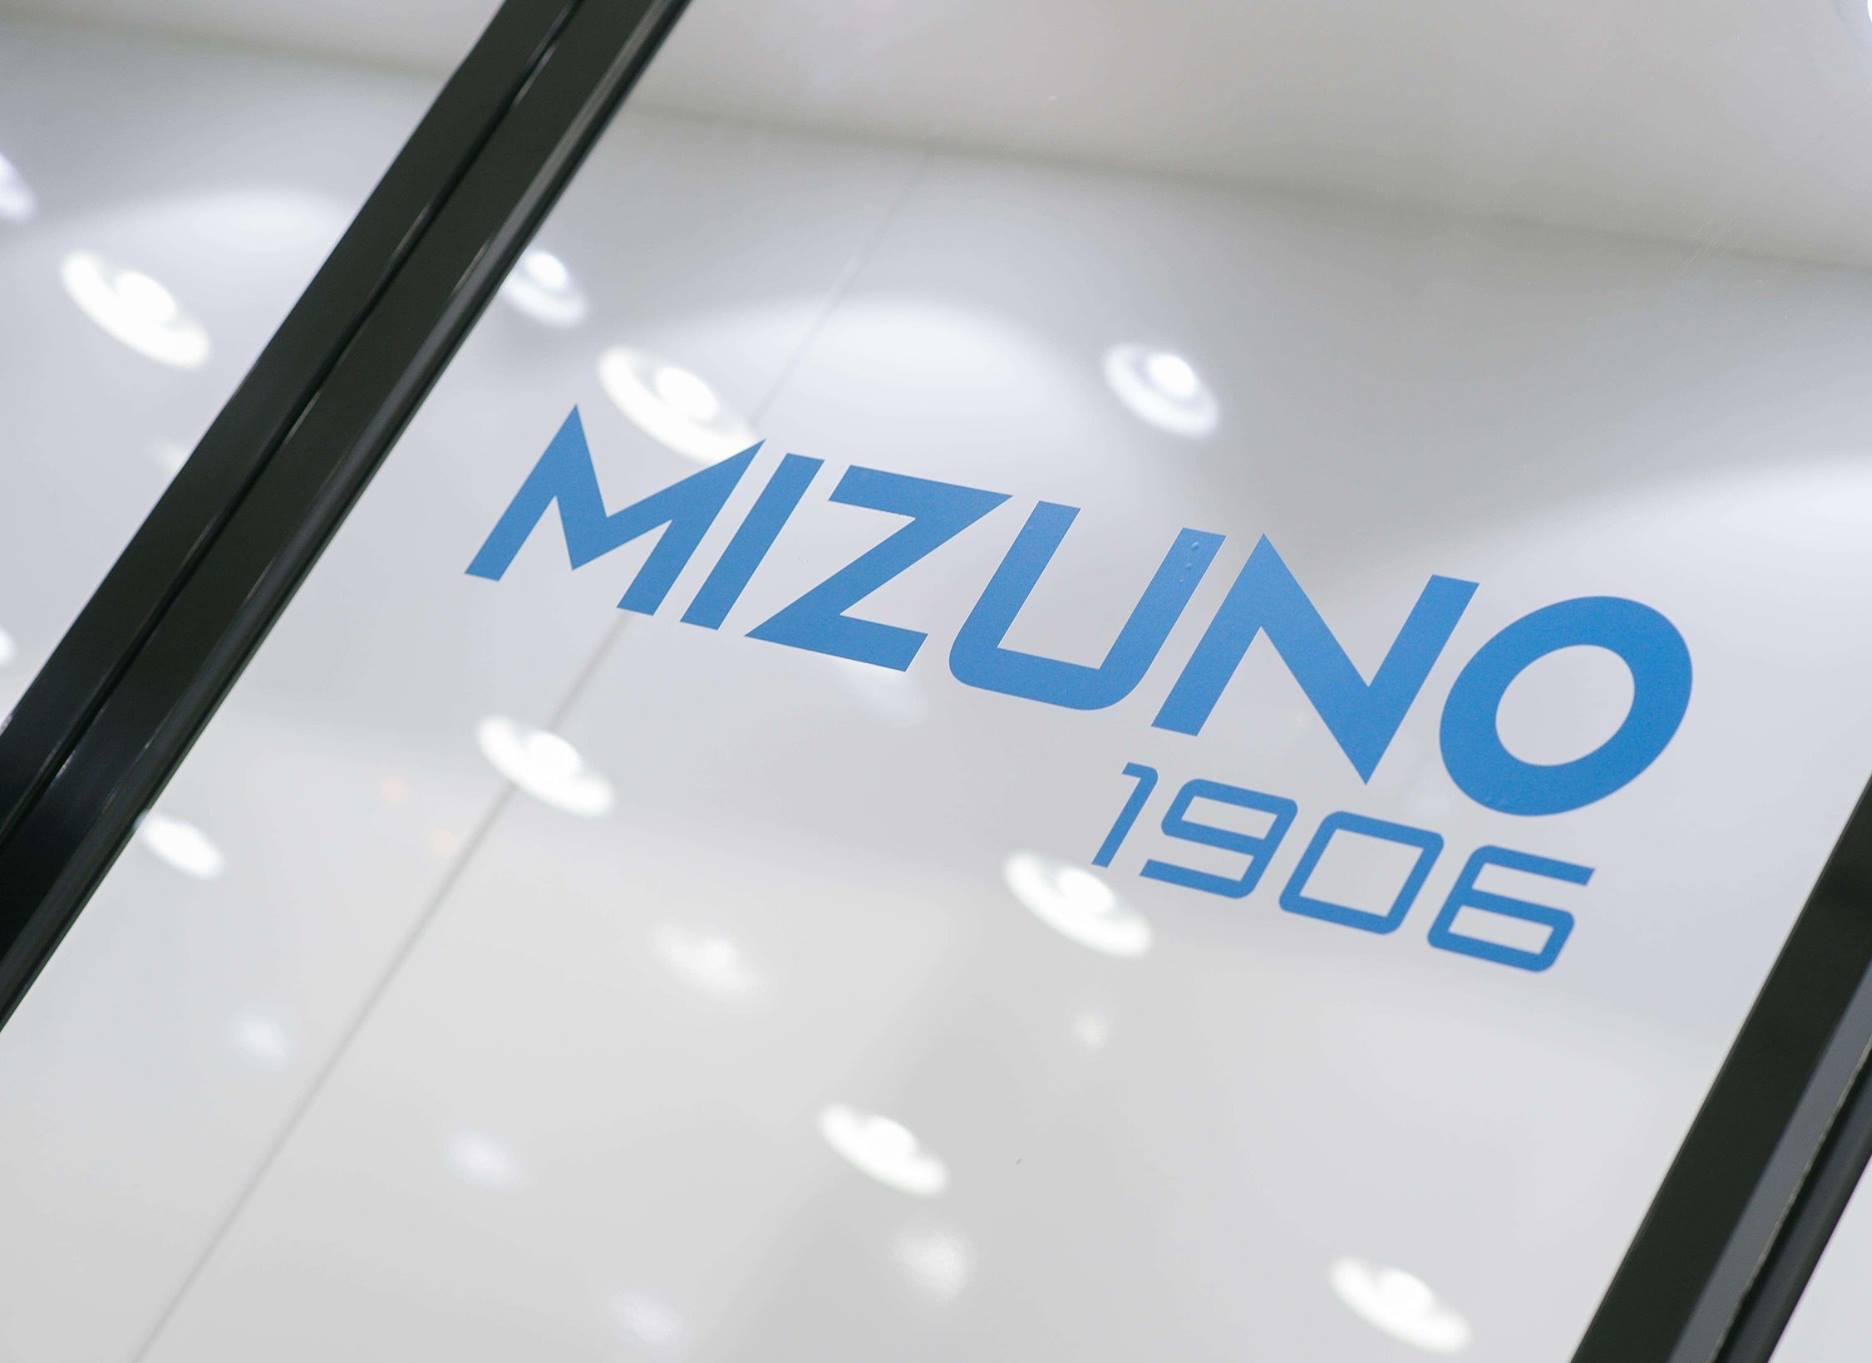 Mizuno Shinzo Lab